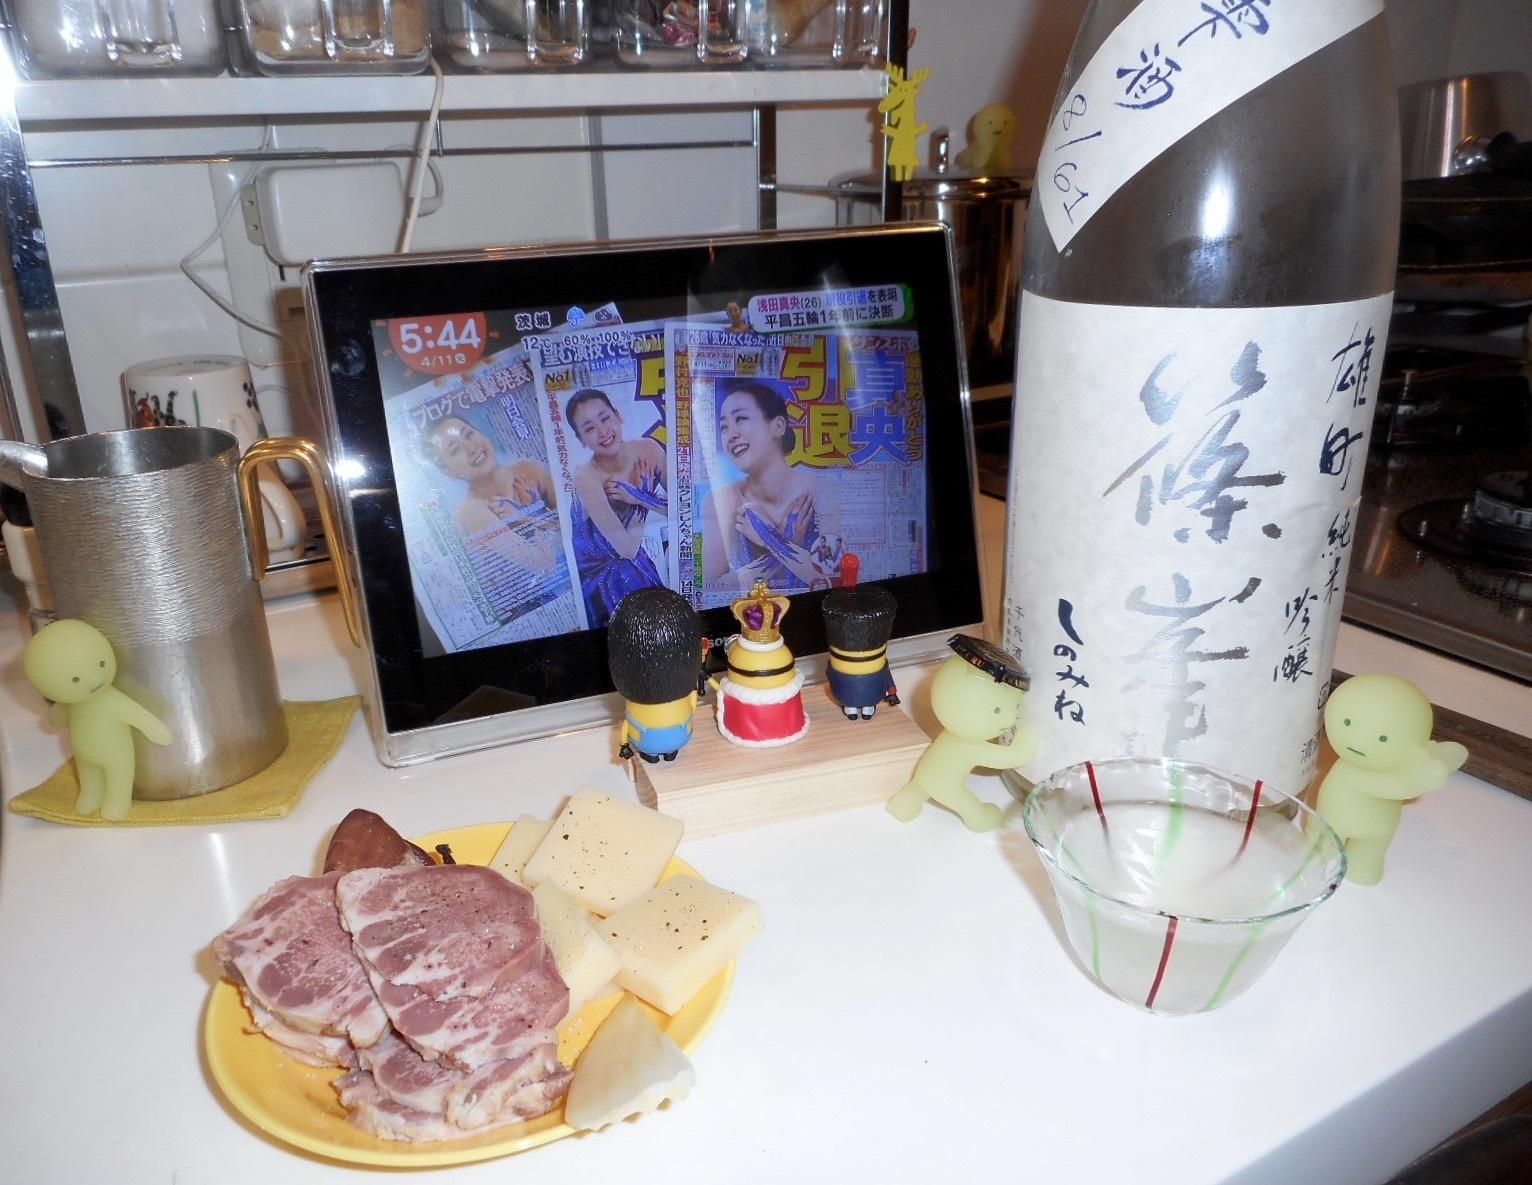 shinomine_fukuro_omachi27by13.jpg